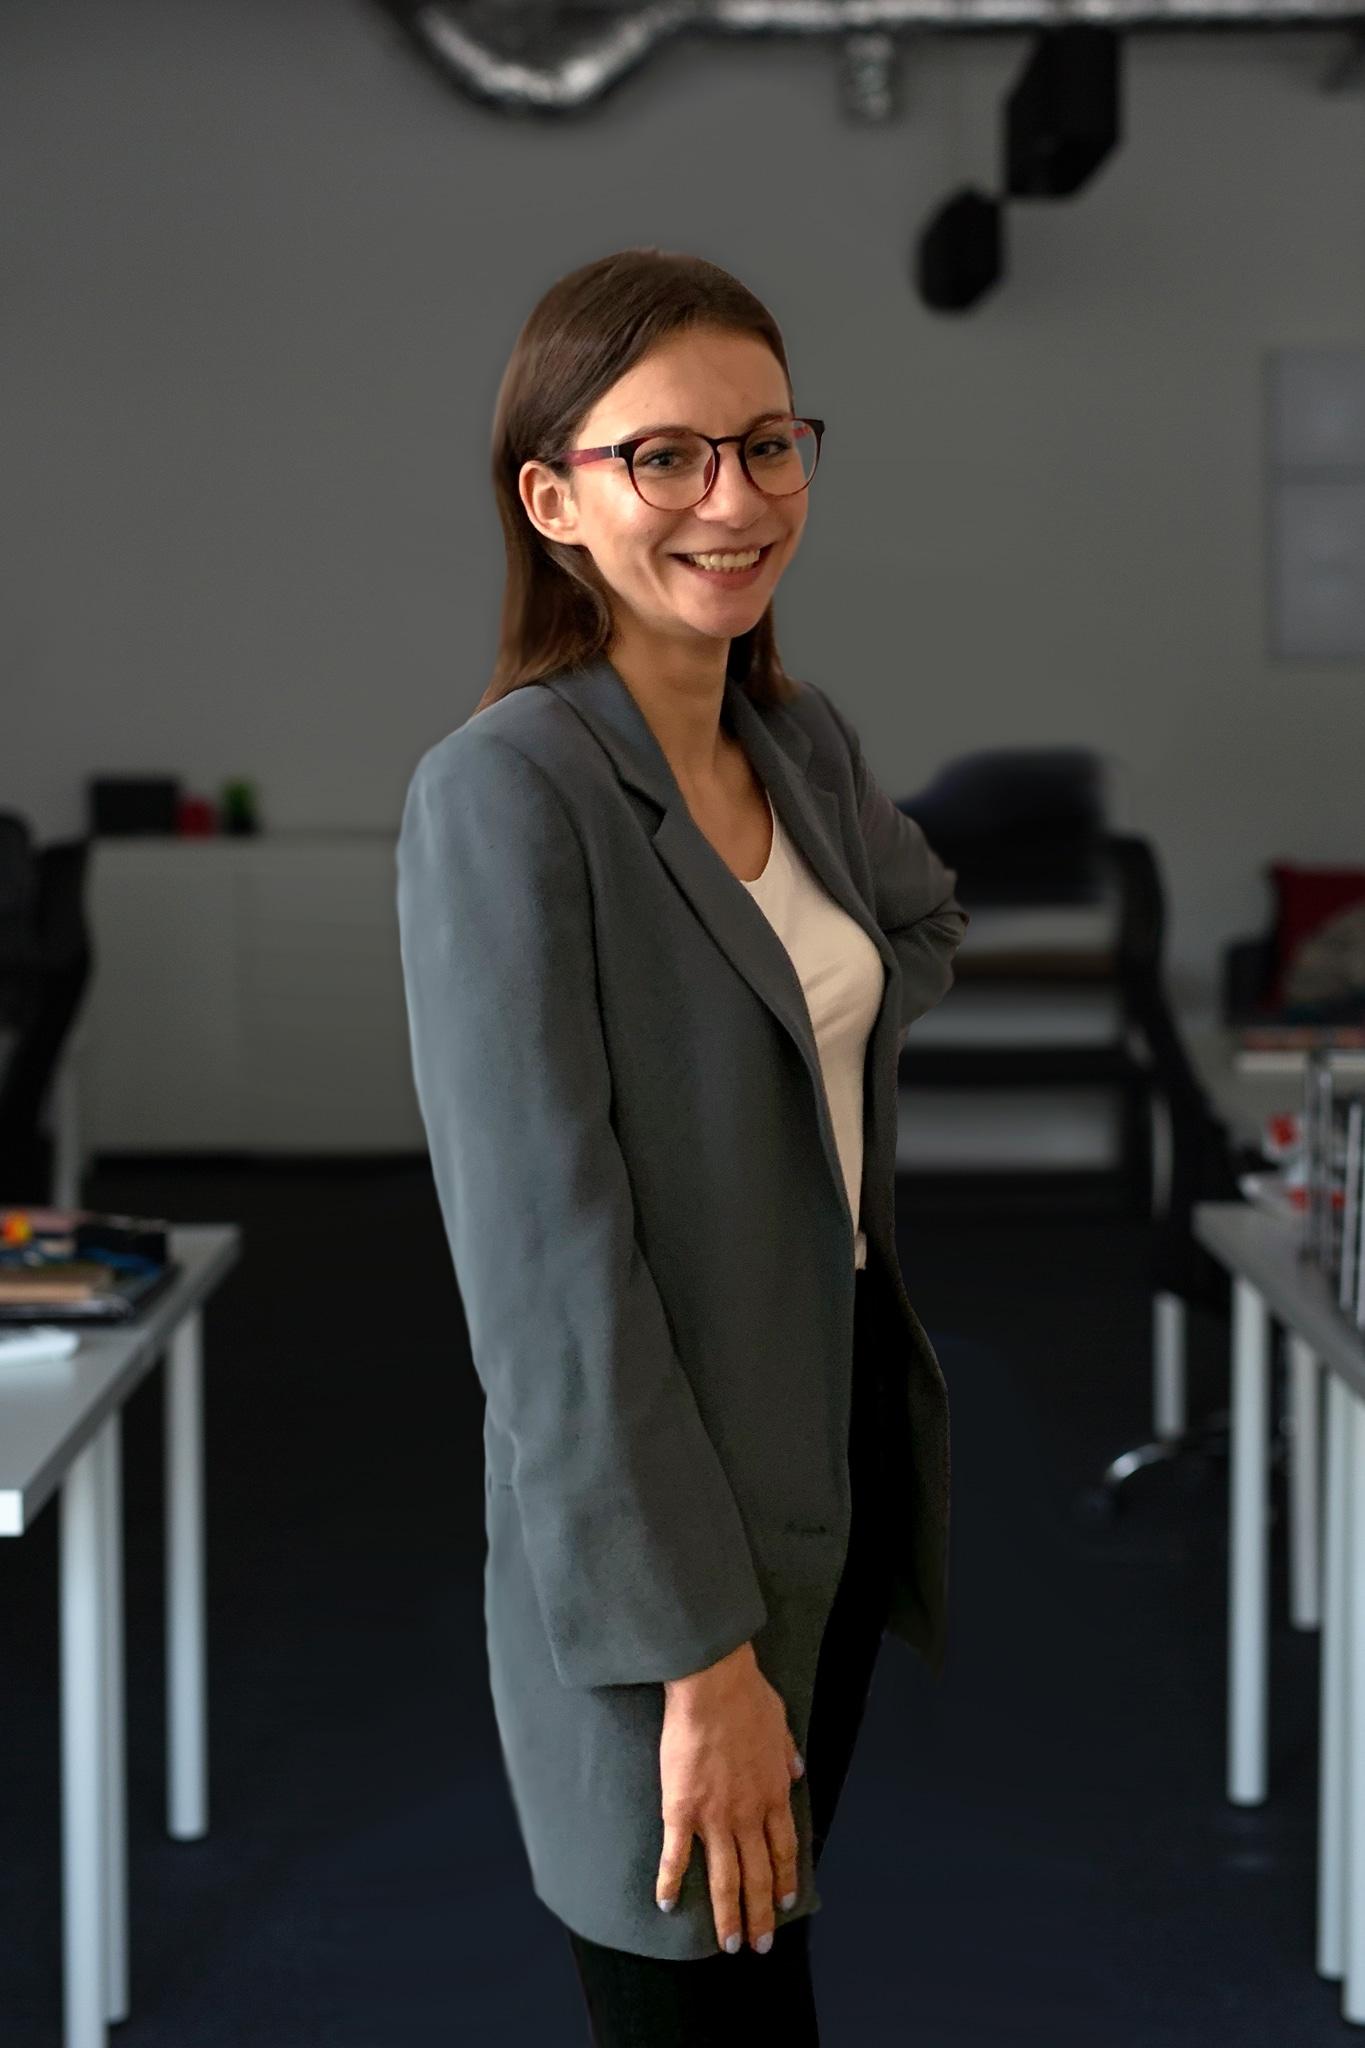 Lidia Skowrońska IT Rekrutere